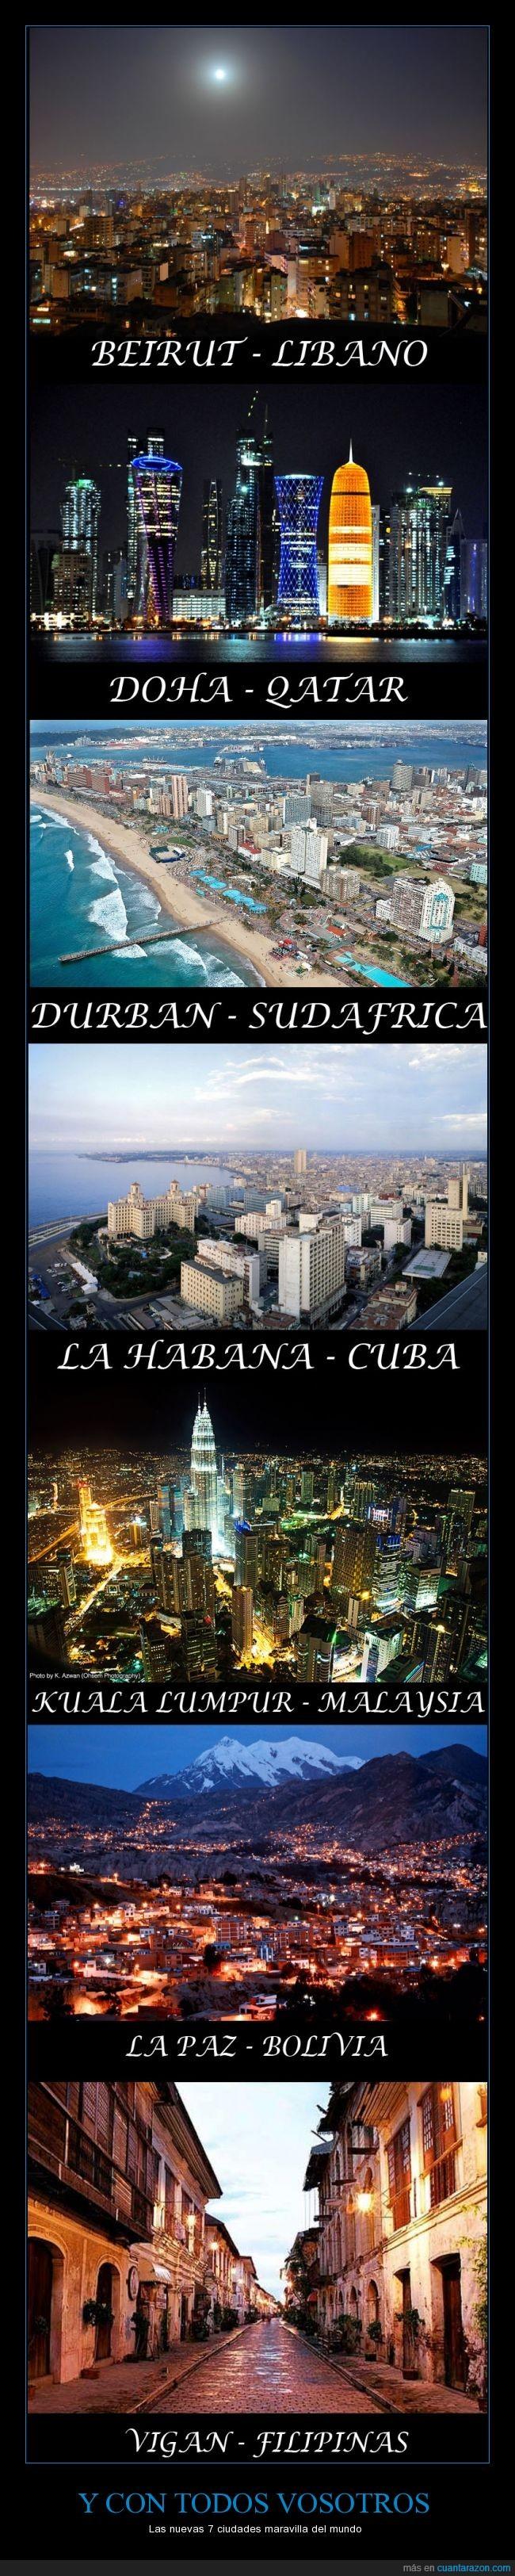 Beirut,Bolivia,ciudades maravillosas,Cuba,Doha,Durban,Filipinas,Kuala Lumpur,La Habana,La Paz,Libano,Malaysia,new 7 wonders,Qatar,Sudafrica,Vigan